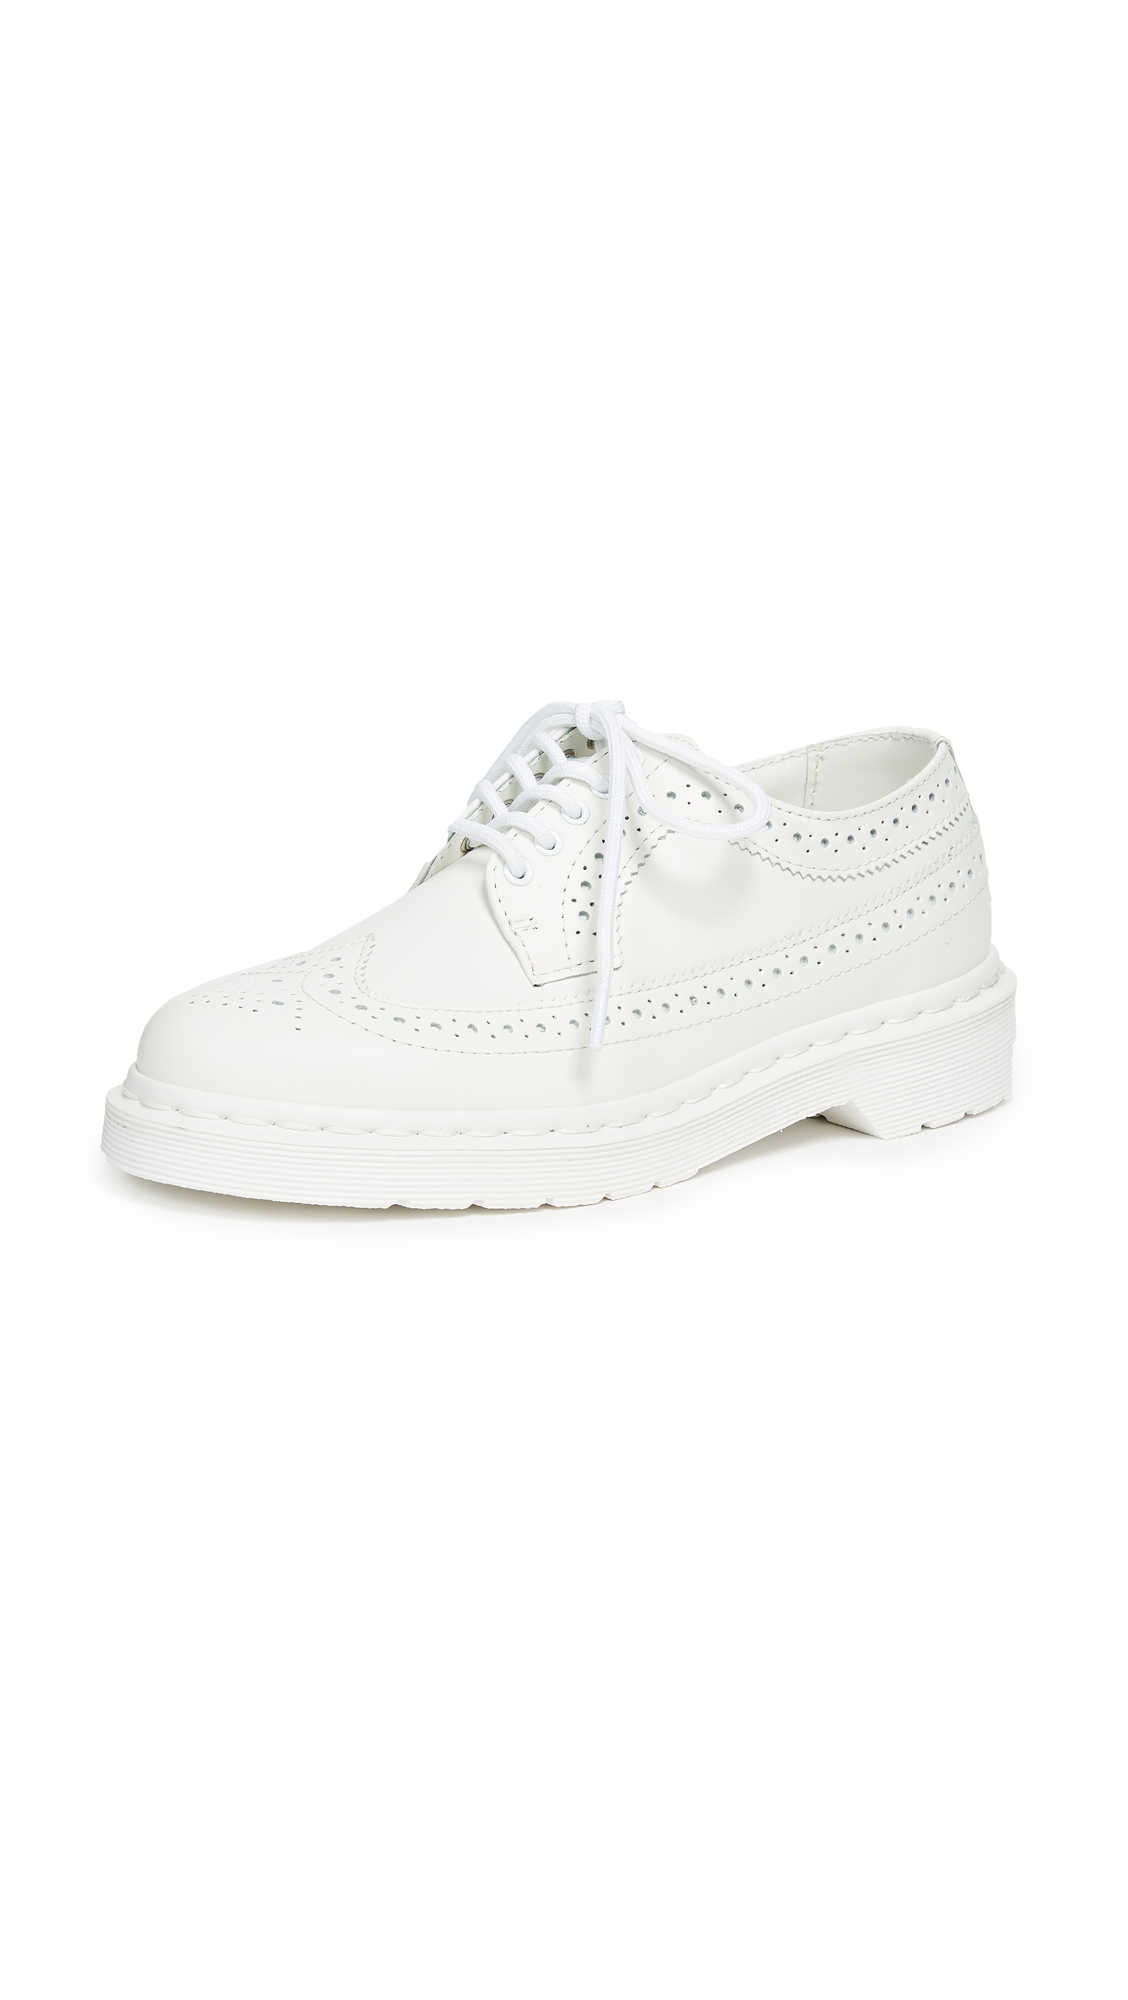 Dr. Martens 3989 Mono Shoes - White